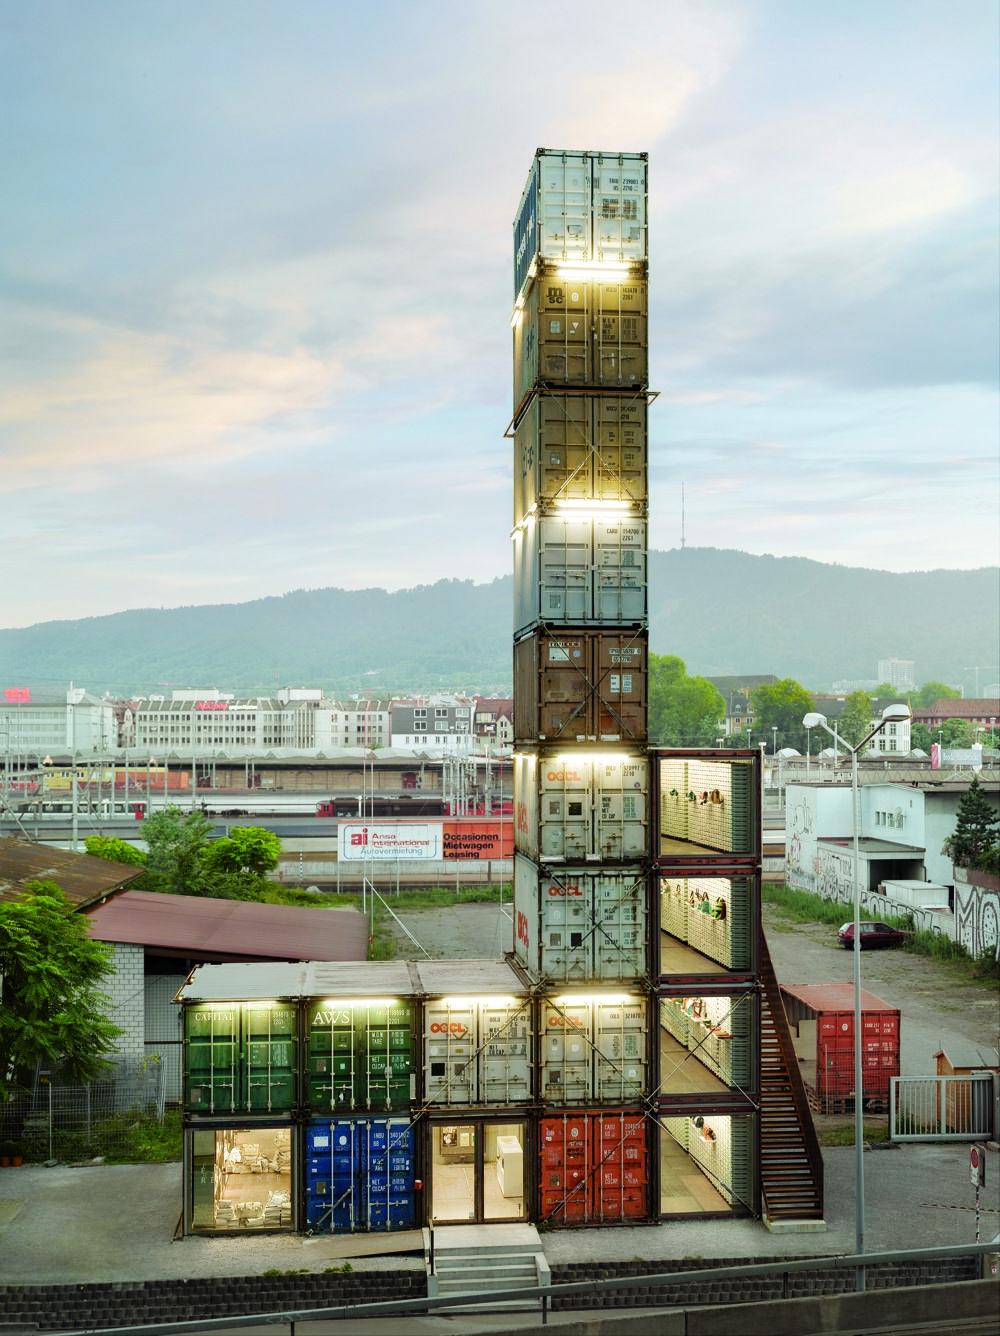 Freitag Flagship Store Zurich | Architecture | Container ...